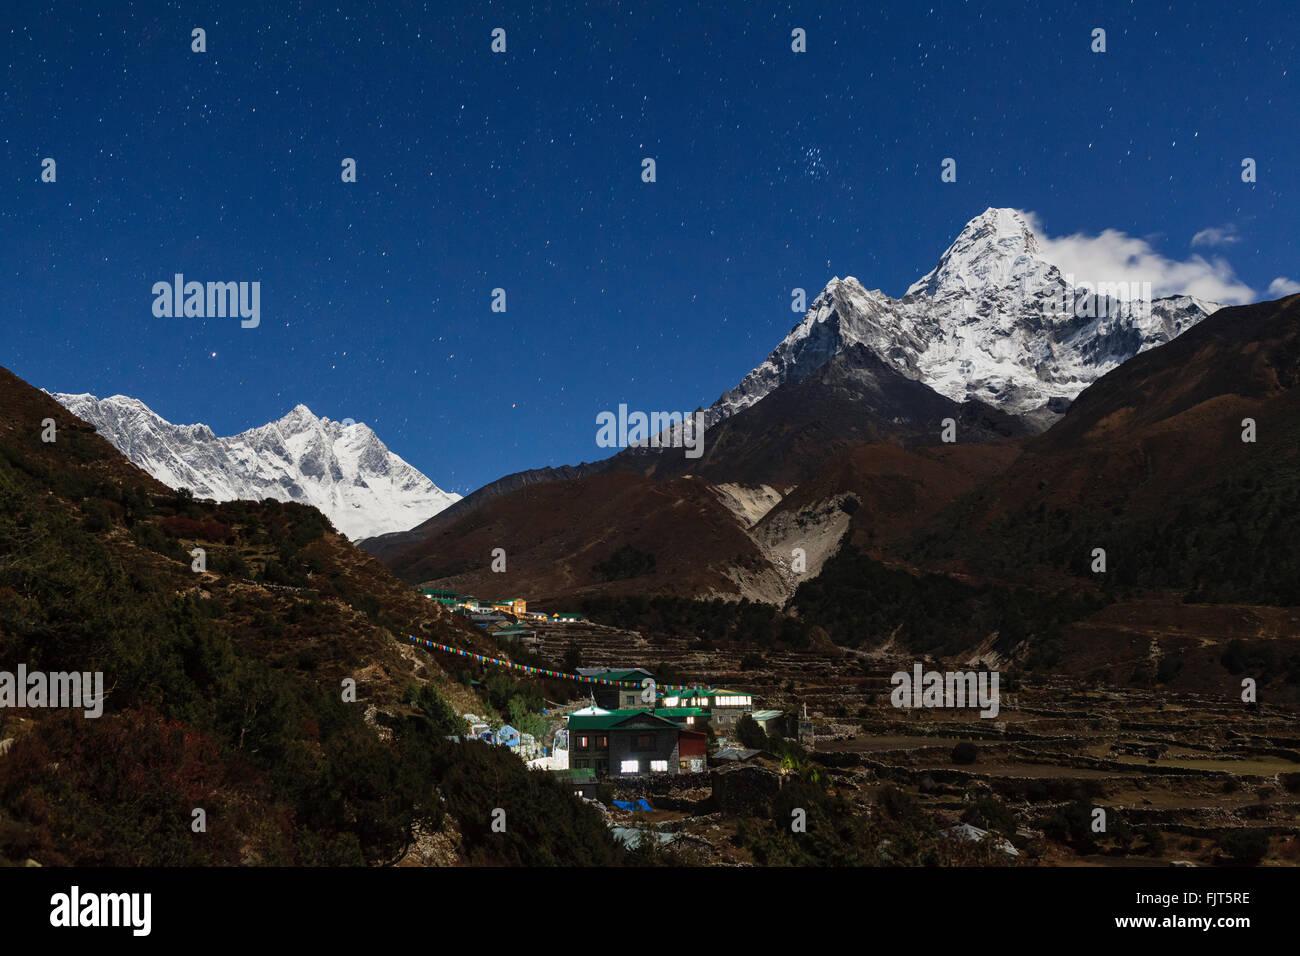 Moonlight over Pangboche. Sagarmatha National Park. Solukhumbu District. Nepal. - Stock Image